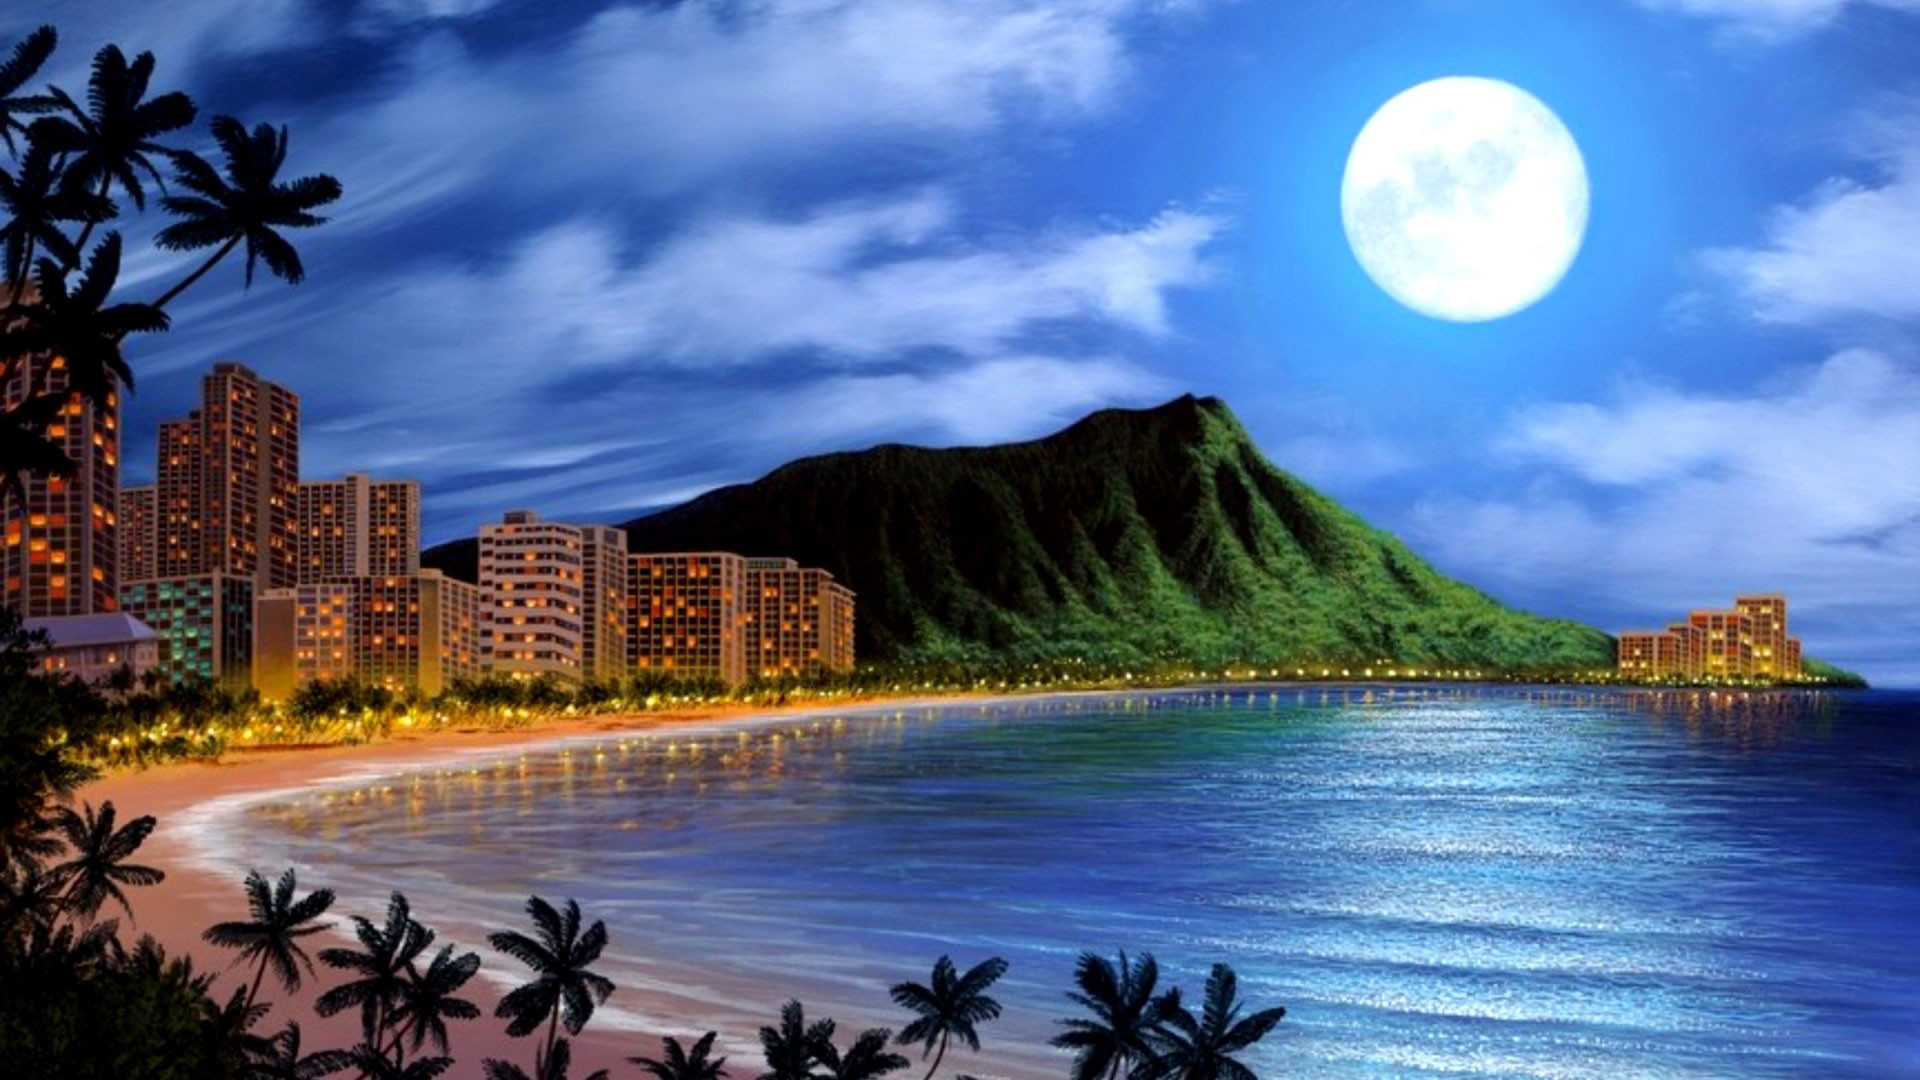 hd pics photos awesome beach buildings night sea moon nice hd quality desktop  background wallpaper